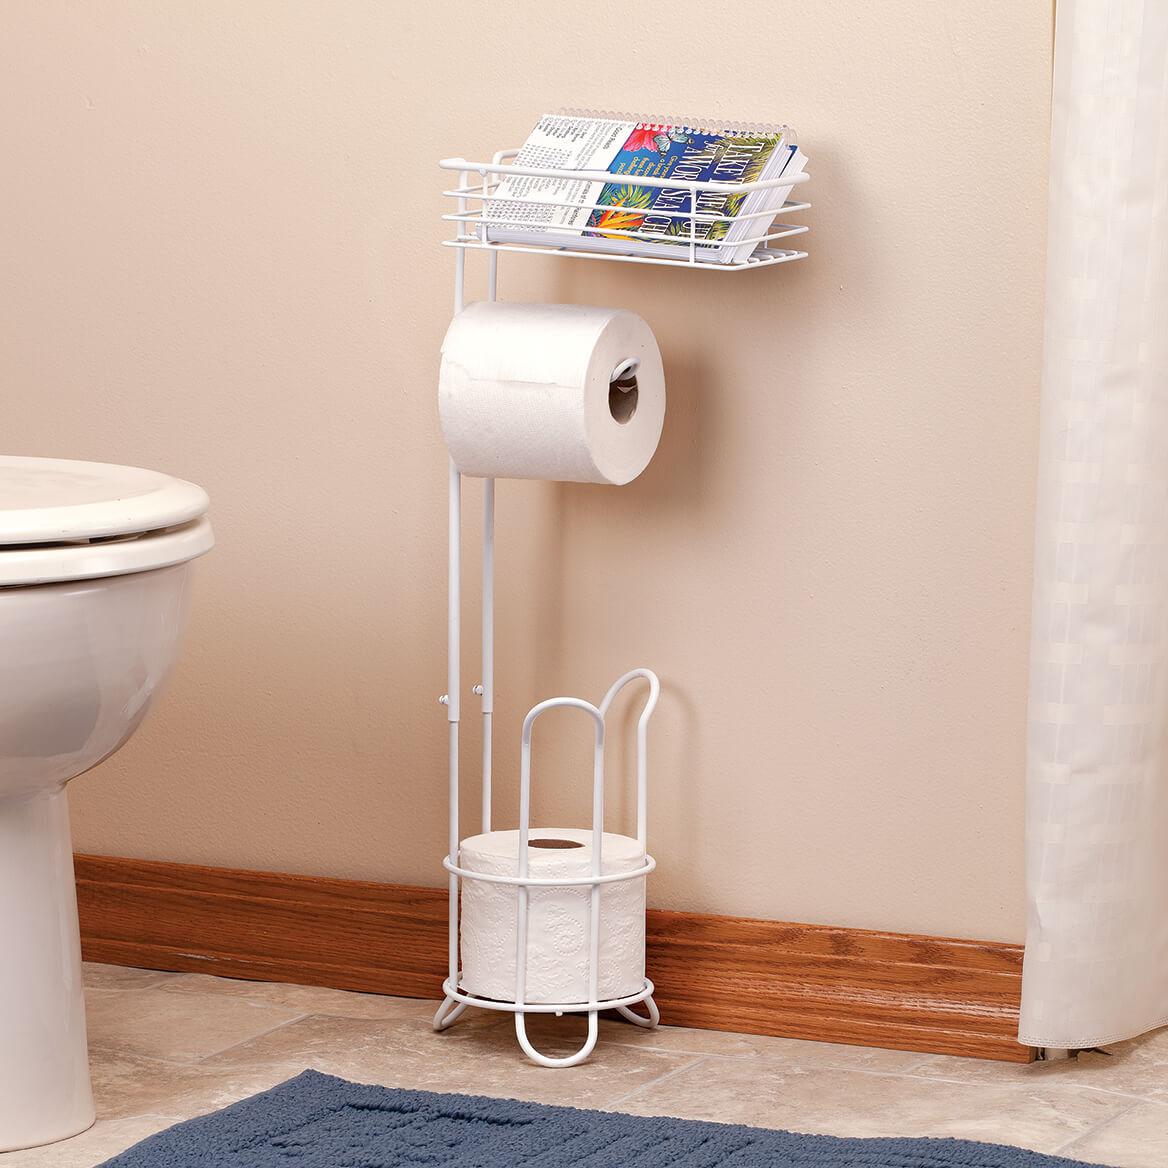 Bathroom Roll and Phone Holder-369619